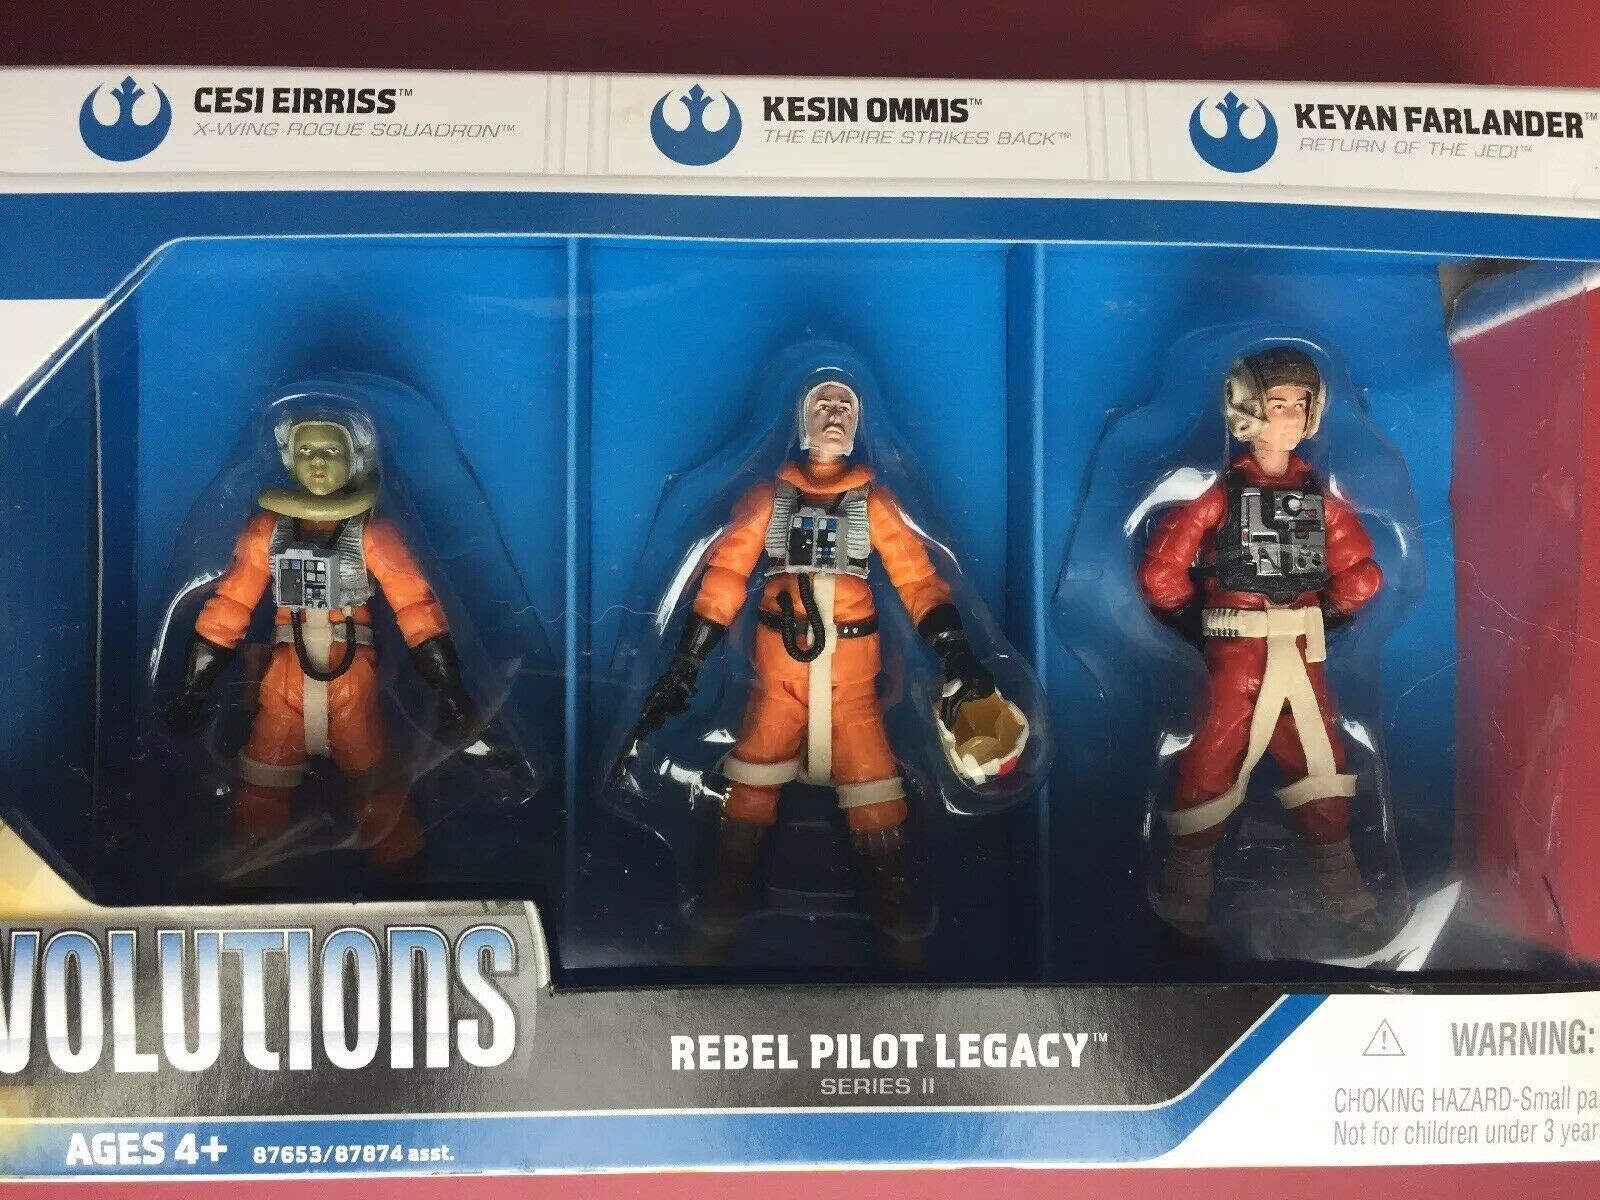 Estrella Wars evoluciones Rebel Piloto legado Cesi Eirriss Kesin Ommis Keyan Farlander